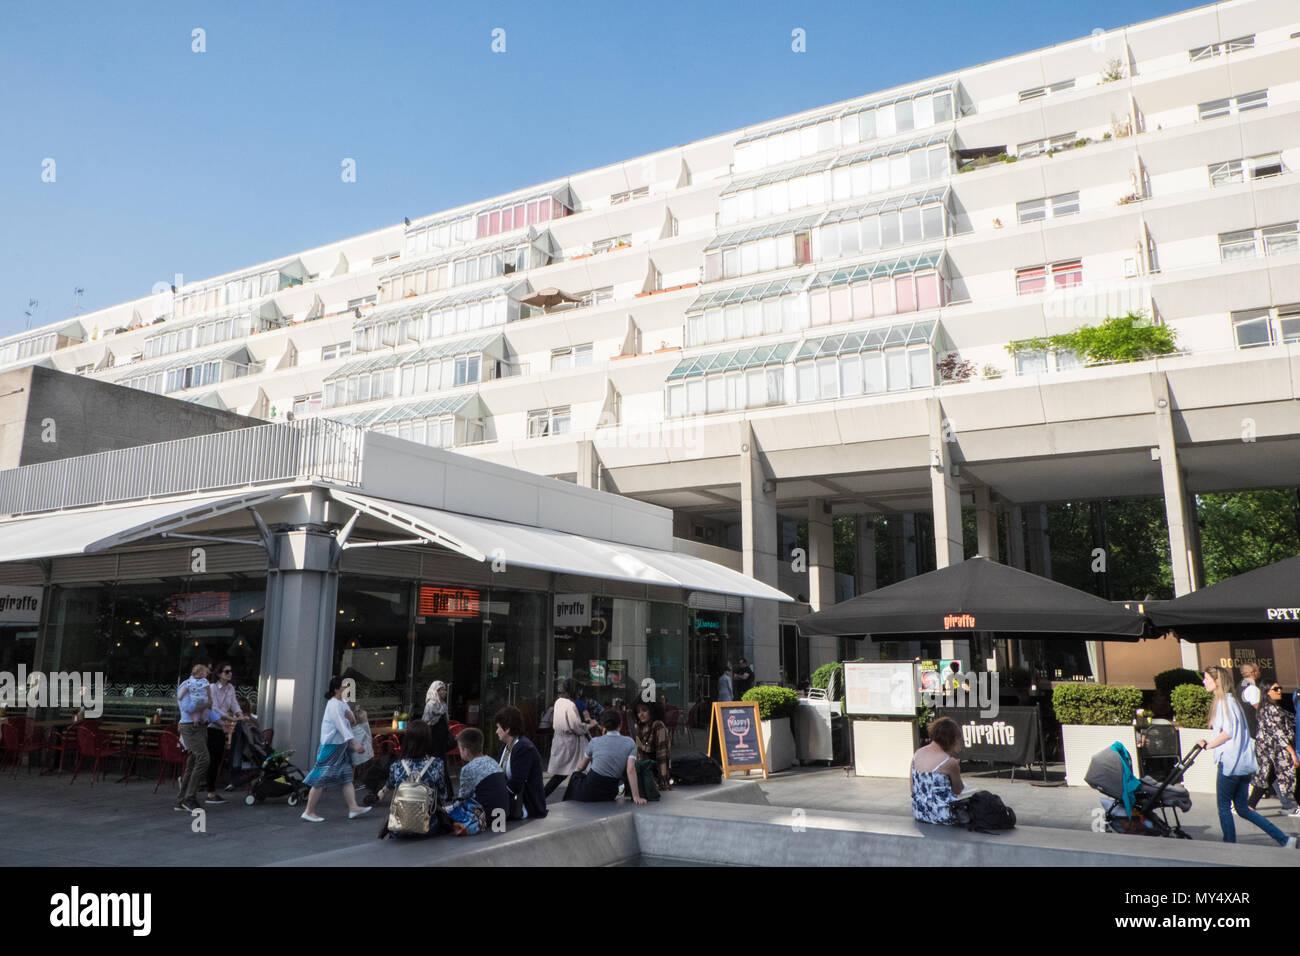 Brunswick,shopping,centre,and,luxury,flats,apartments,London,capital,England,UK,GB,English,British,Europe,European, - Stock Image